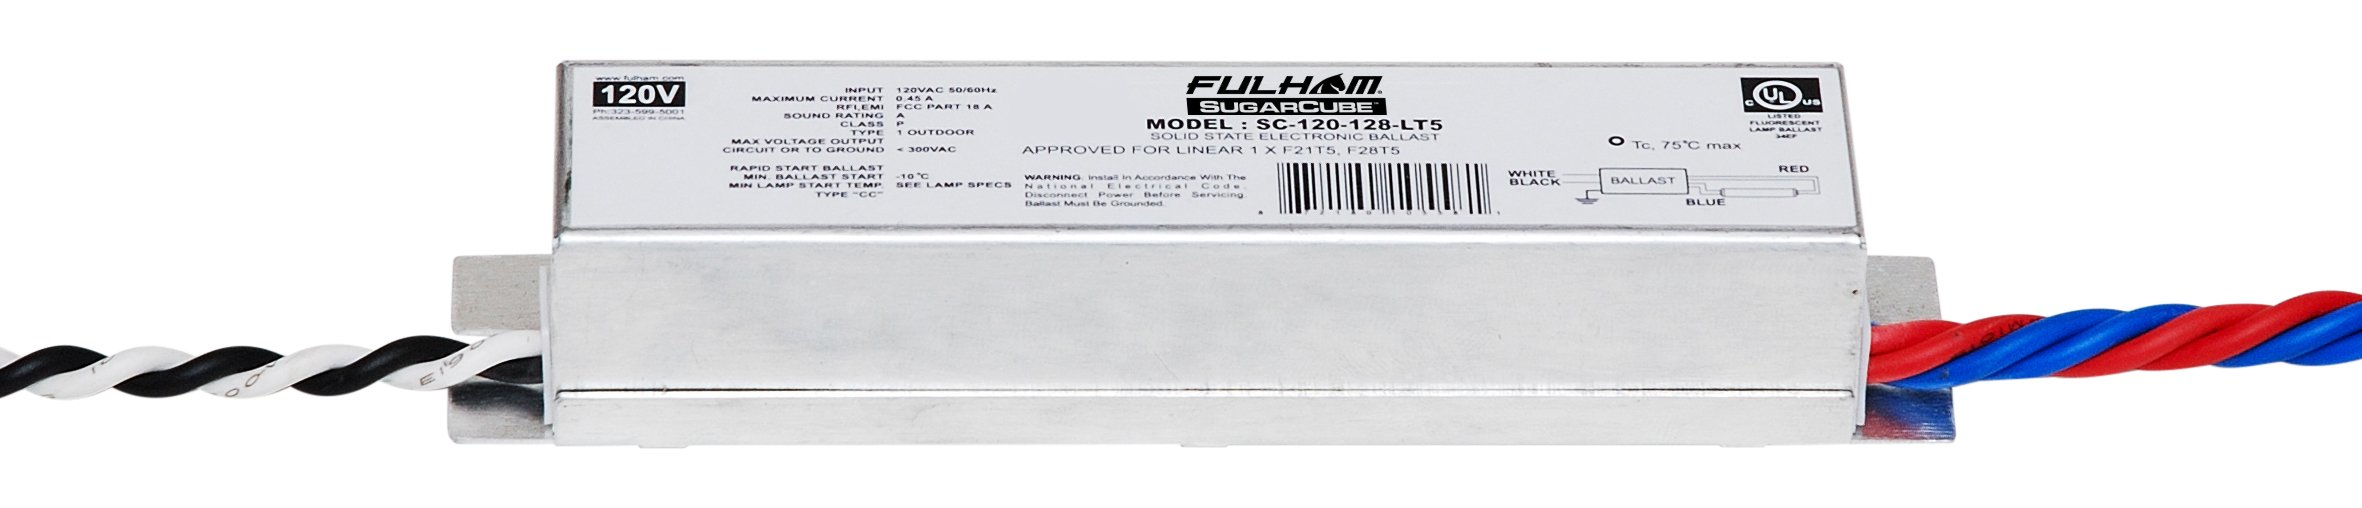 Fulham SC-120-128-LT5 Sugar Cube Ballast